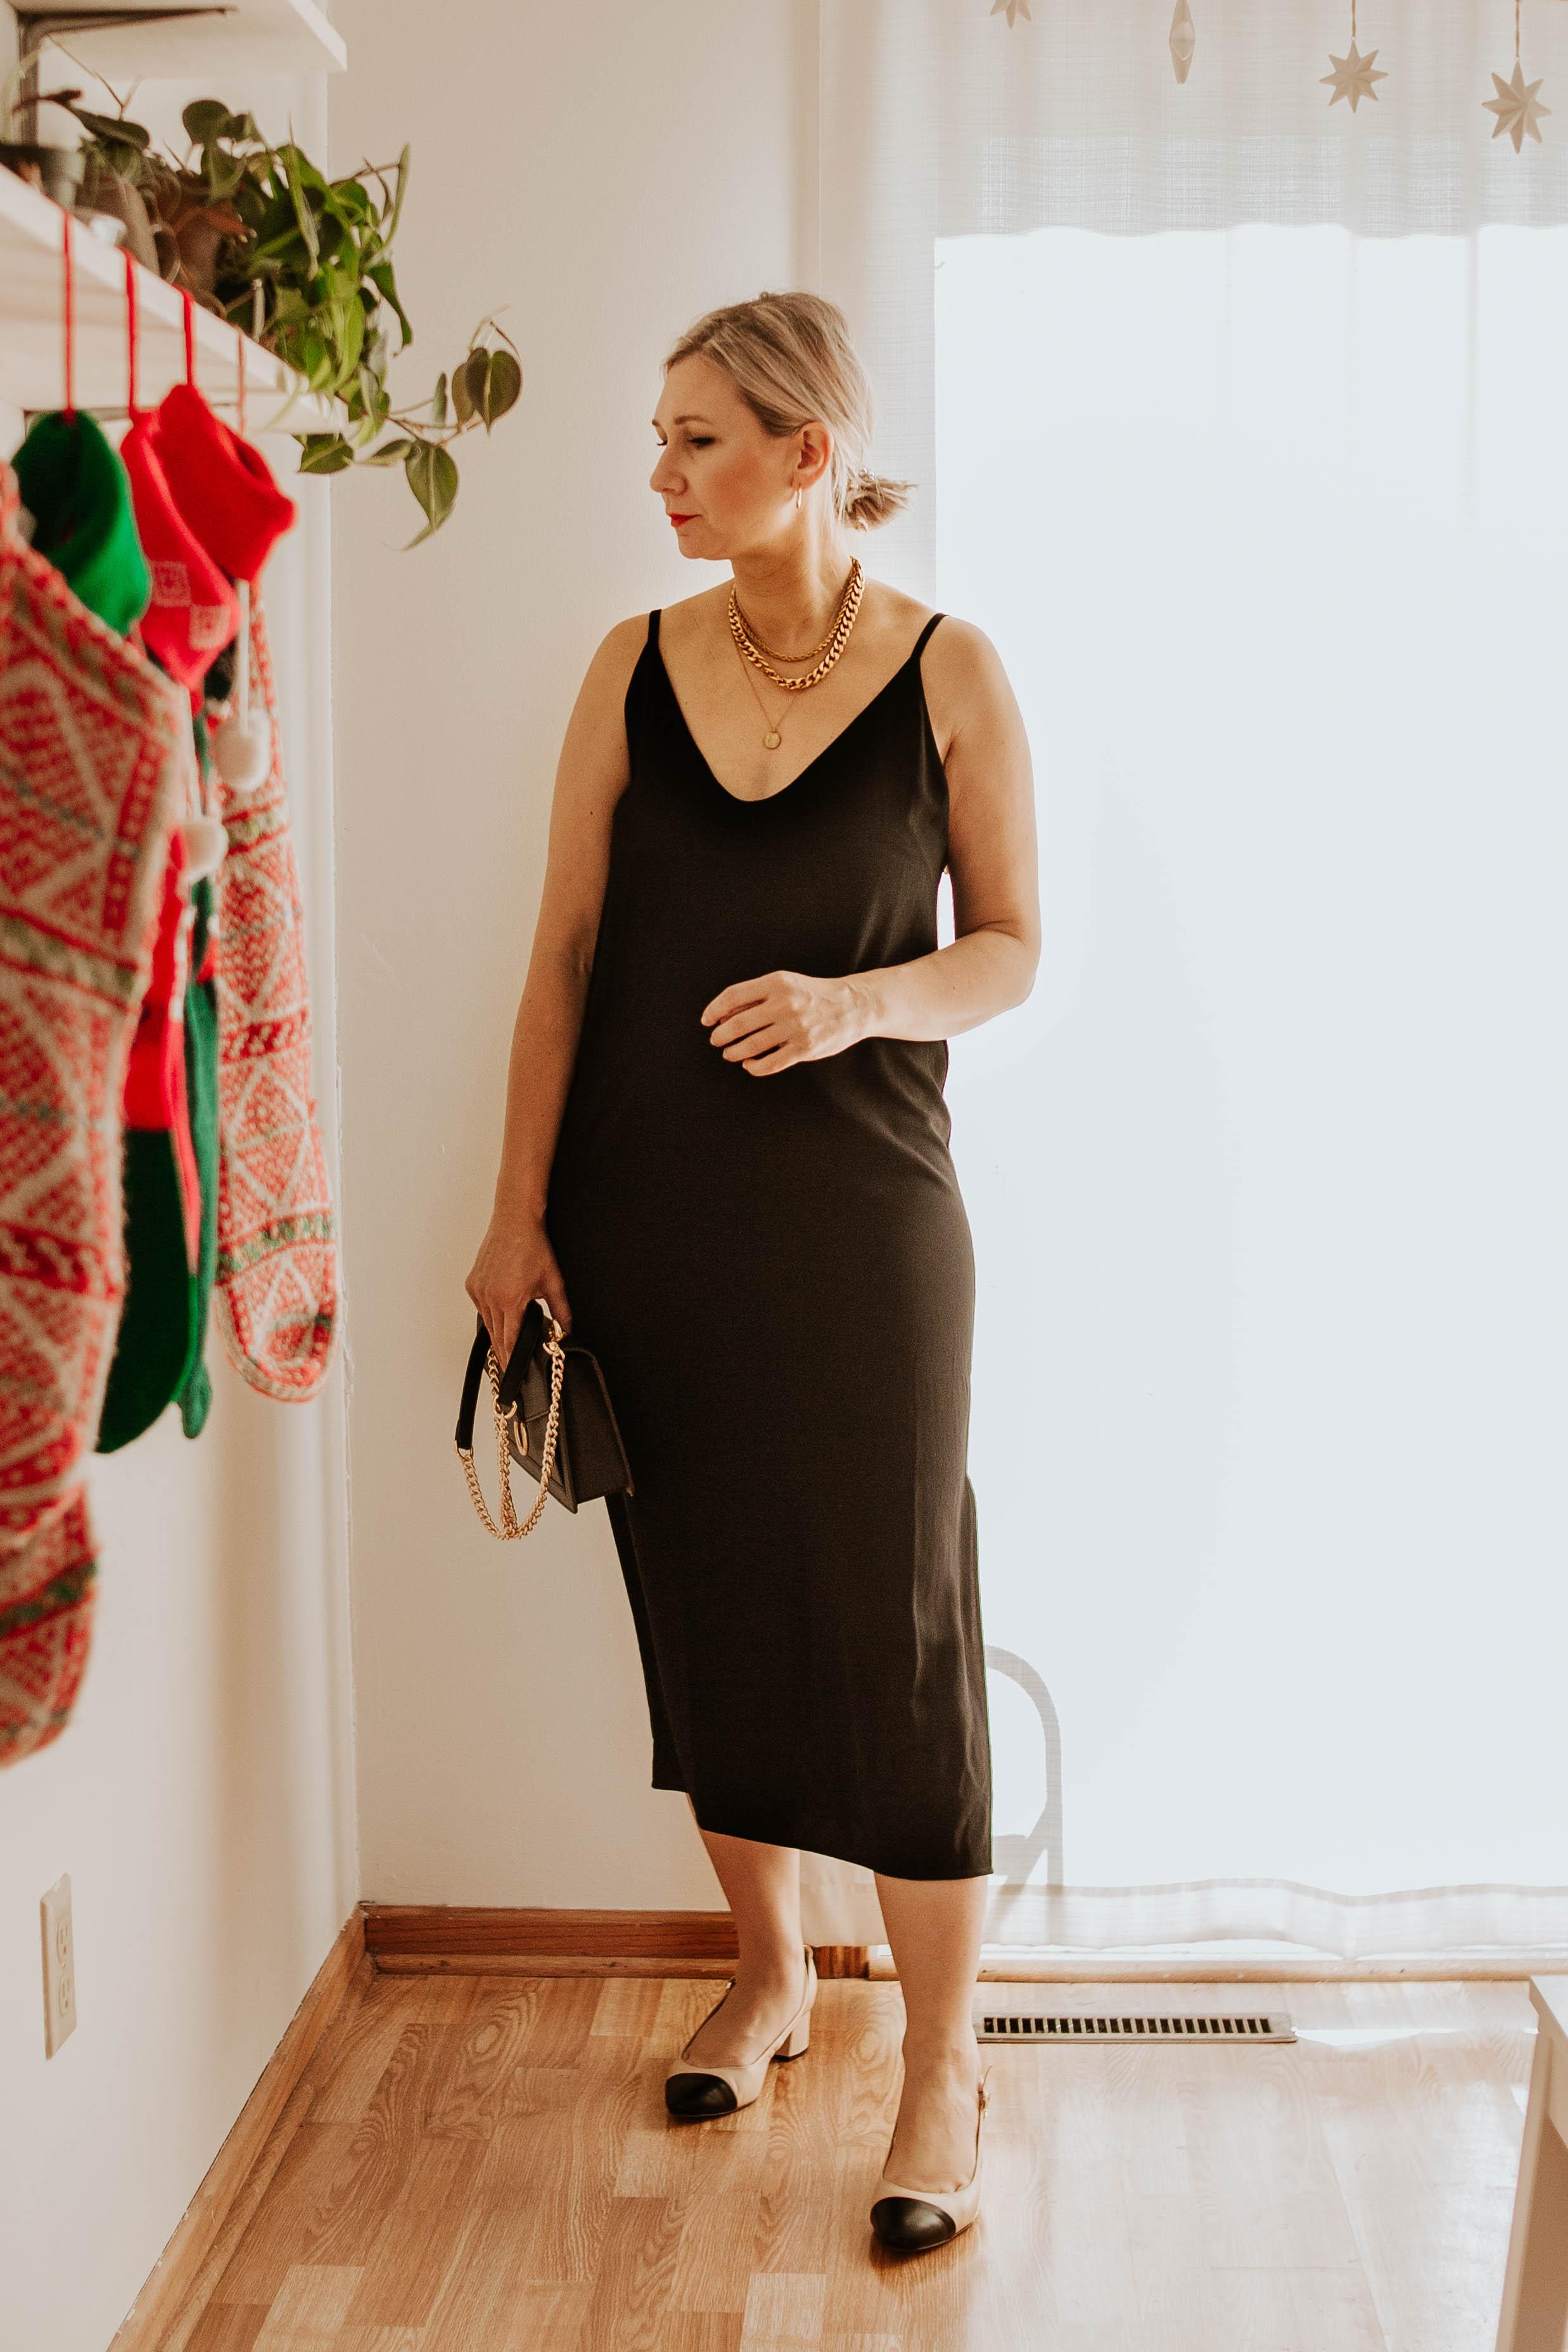 Mini Holiday Lookbook Featuring Ethical Fashion, everlane slip dress, black slip dress, black chain bag, cap toe slingbacks, chanel slingbacks